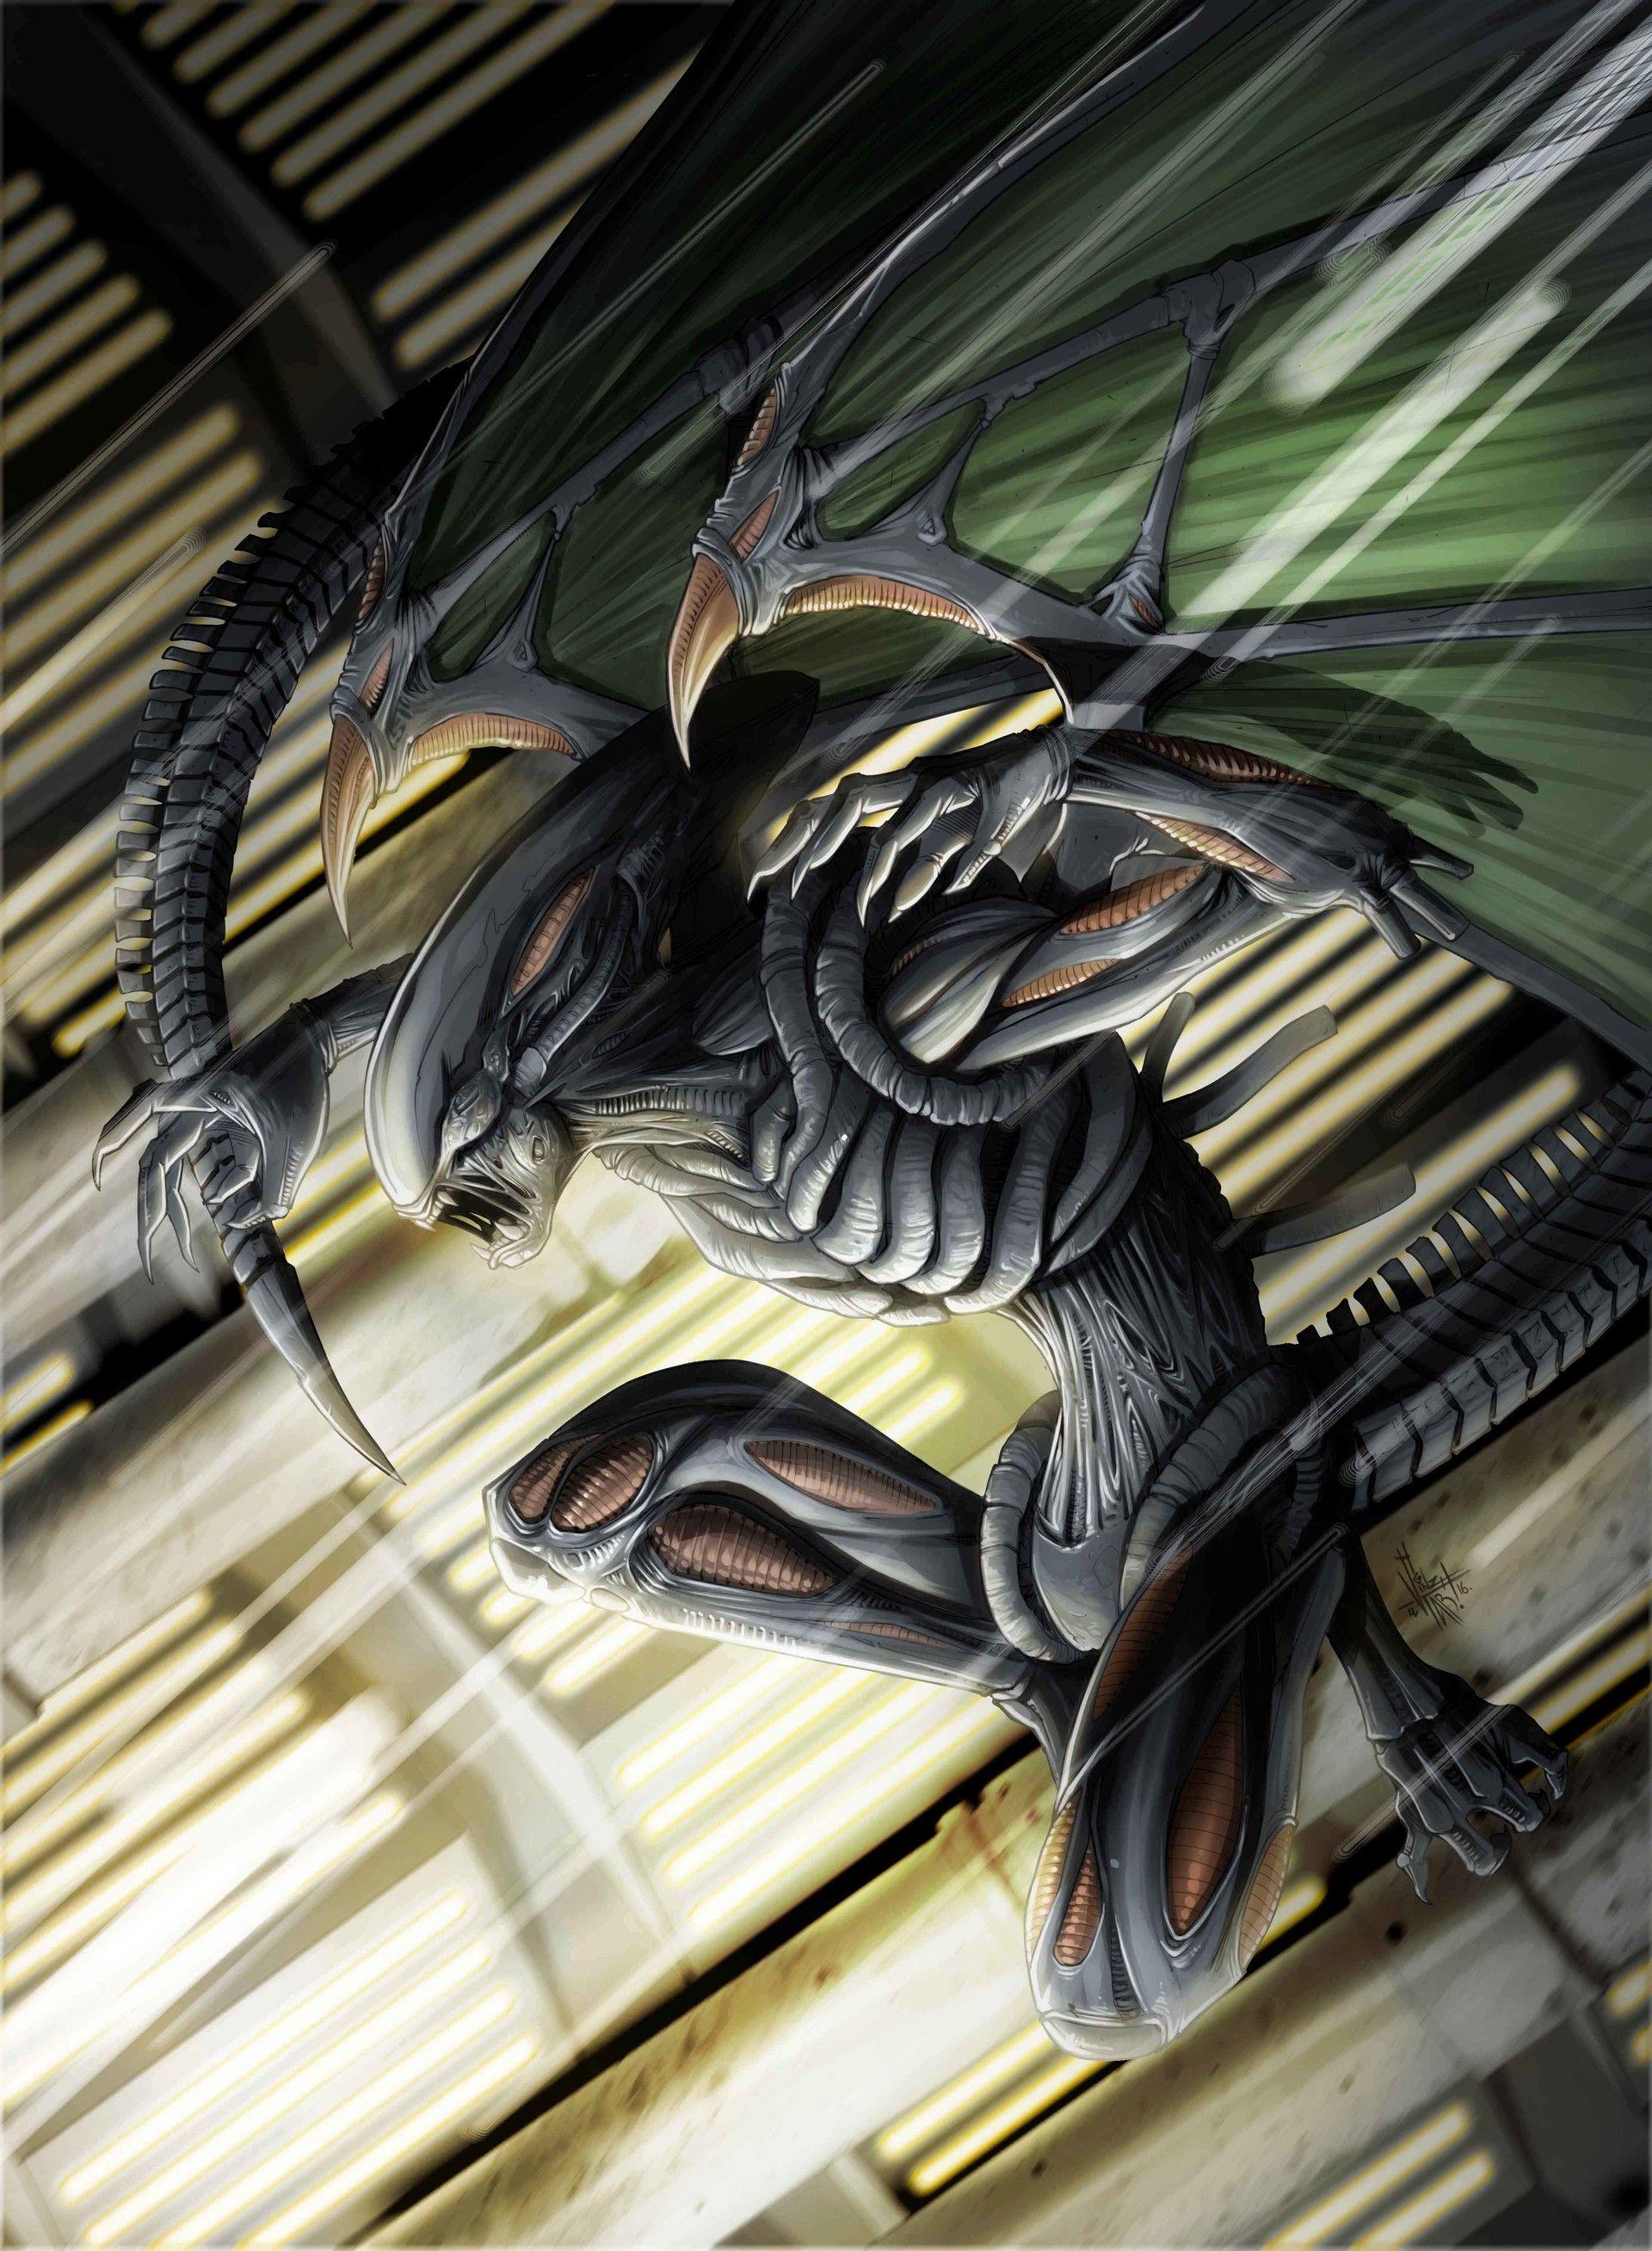 Illustration for BOARD Game Alien legendary encounters. Copyright UPPERDECK & Fox .